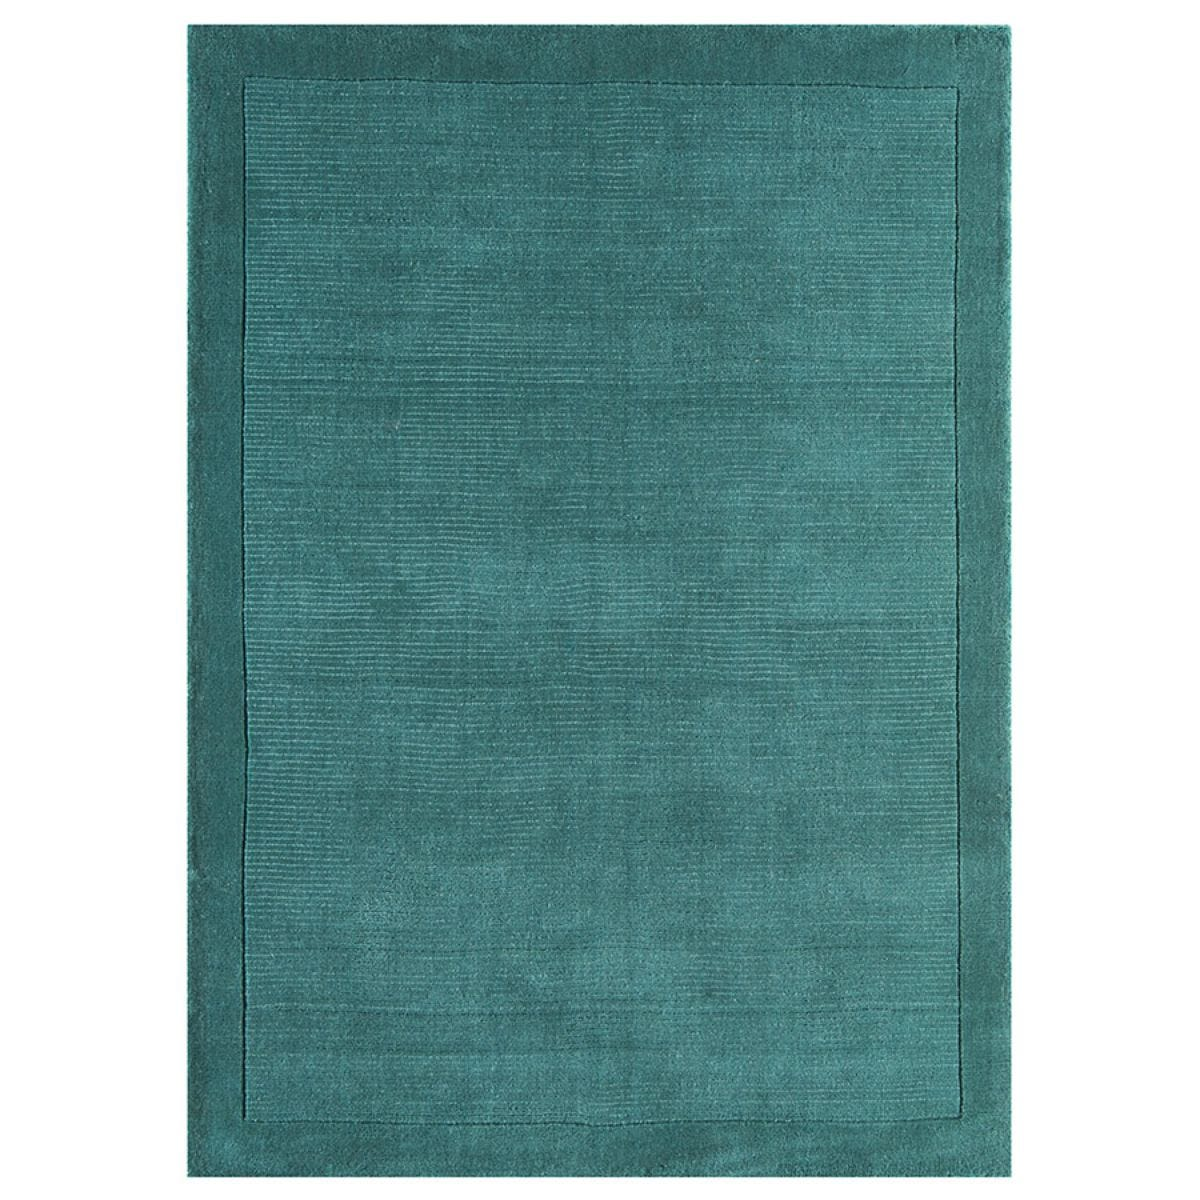 Asiatic Extra Large York Handloom Rug - Teal